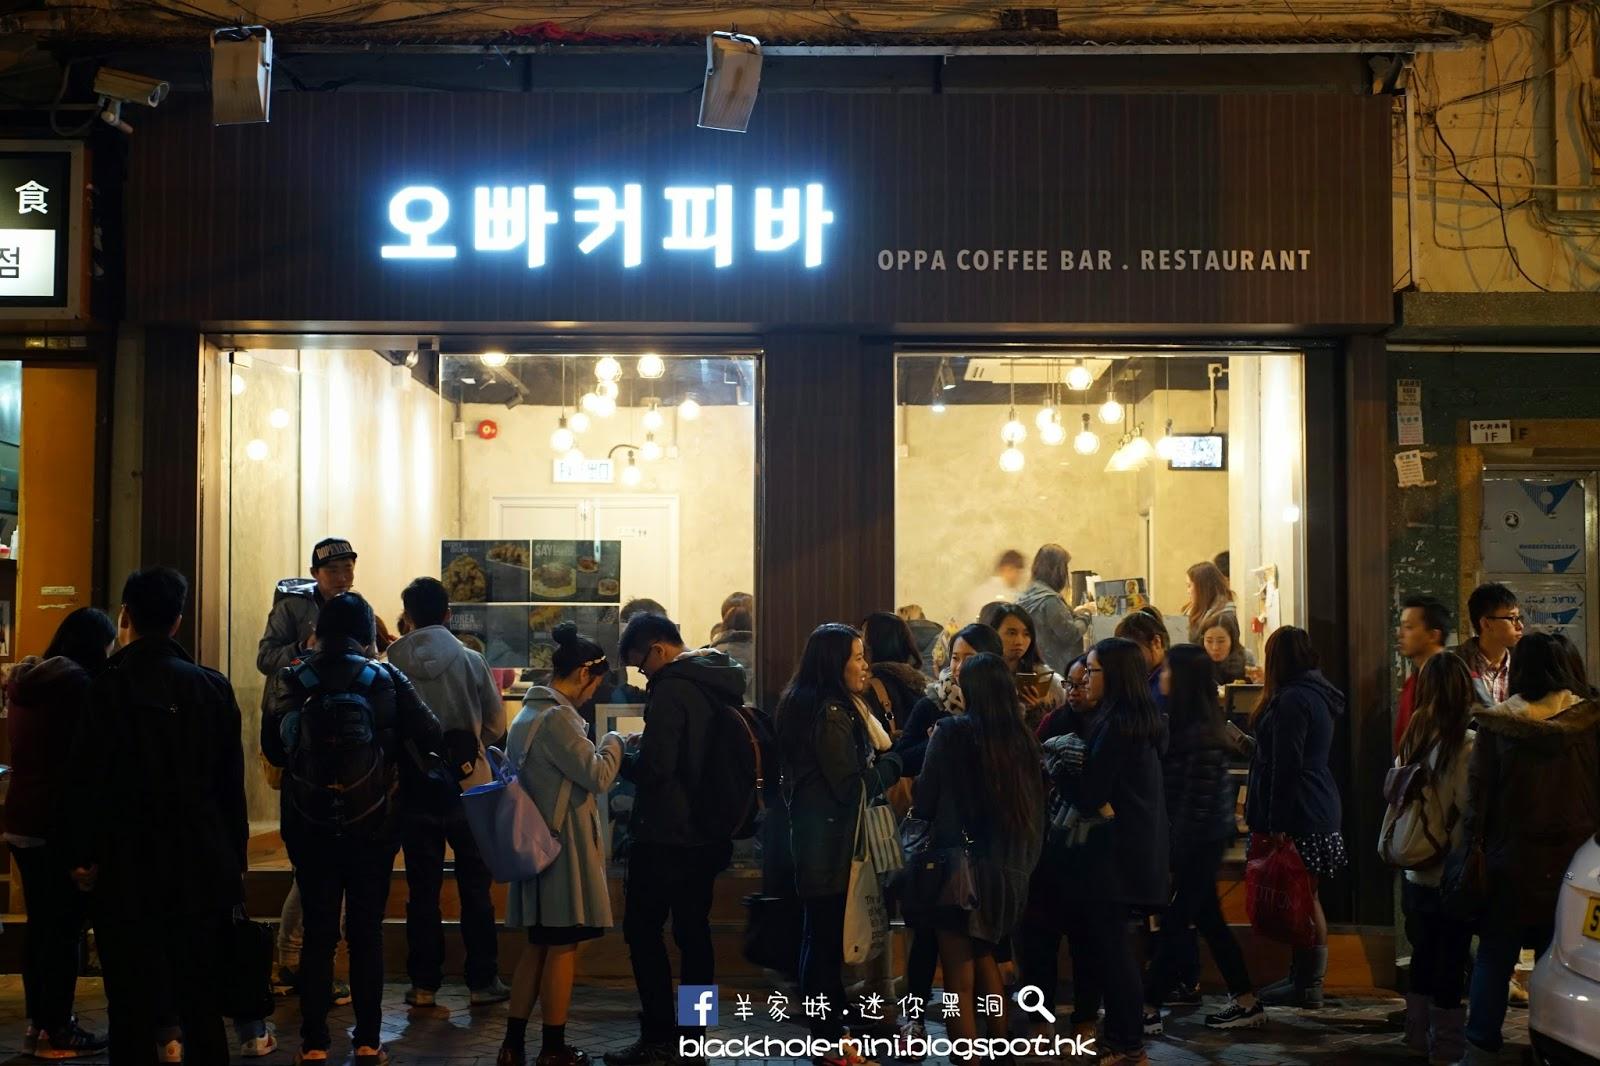 偶然中伏:OPPA Coffee Bar Restaurant